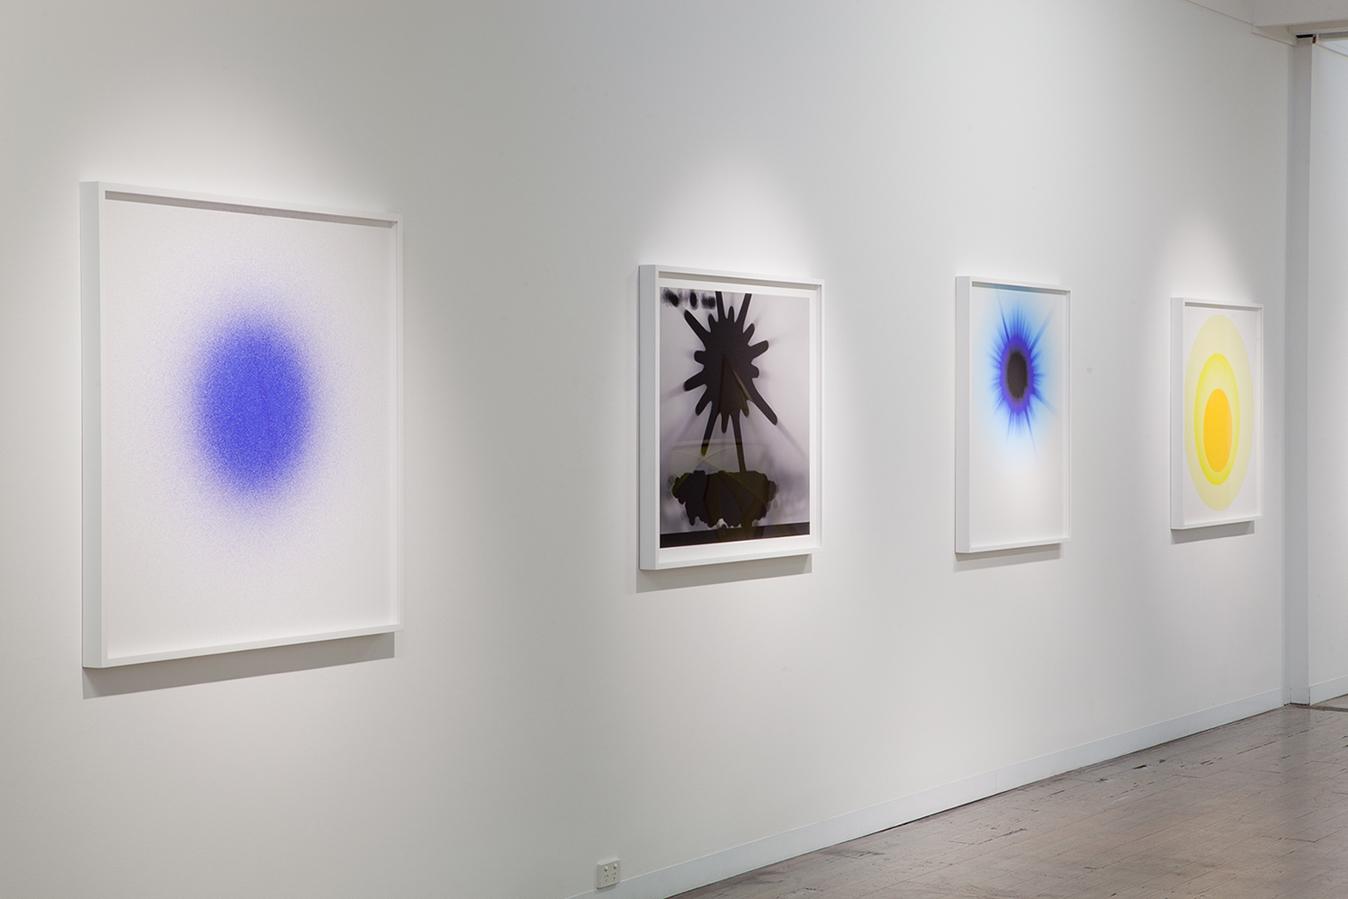 NIKE SAVVAS    Sparks  Exhibition View, 2014